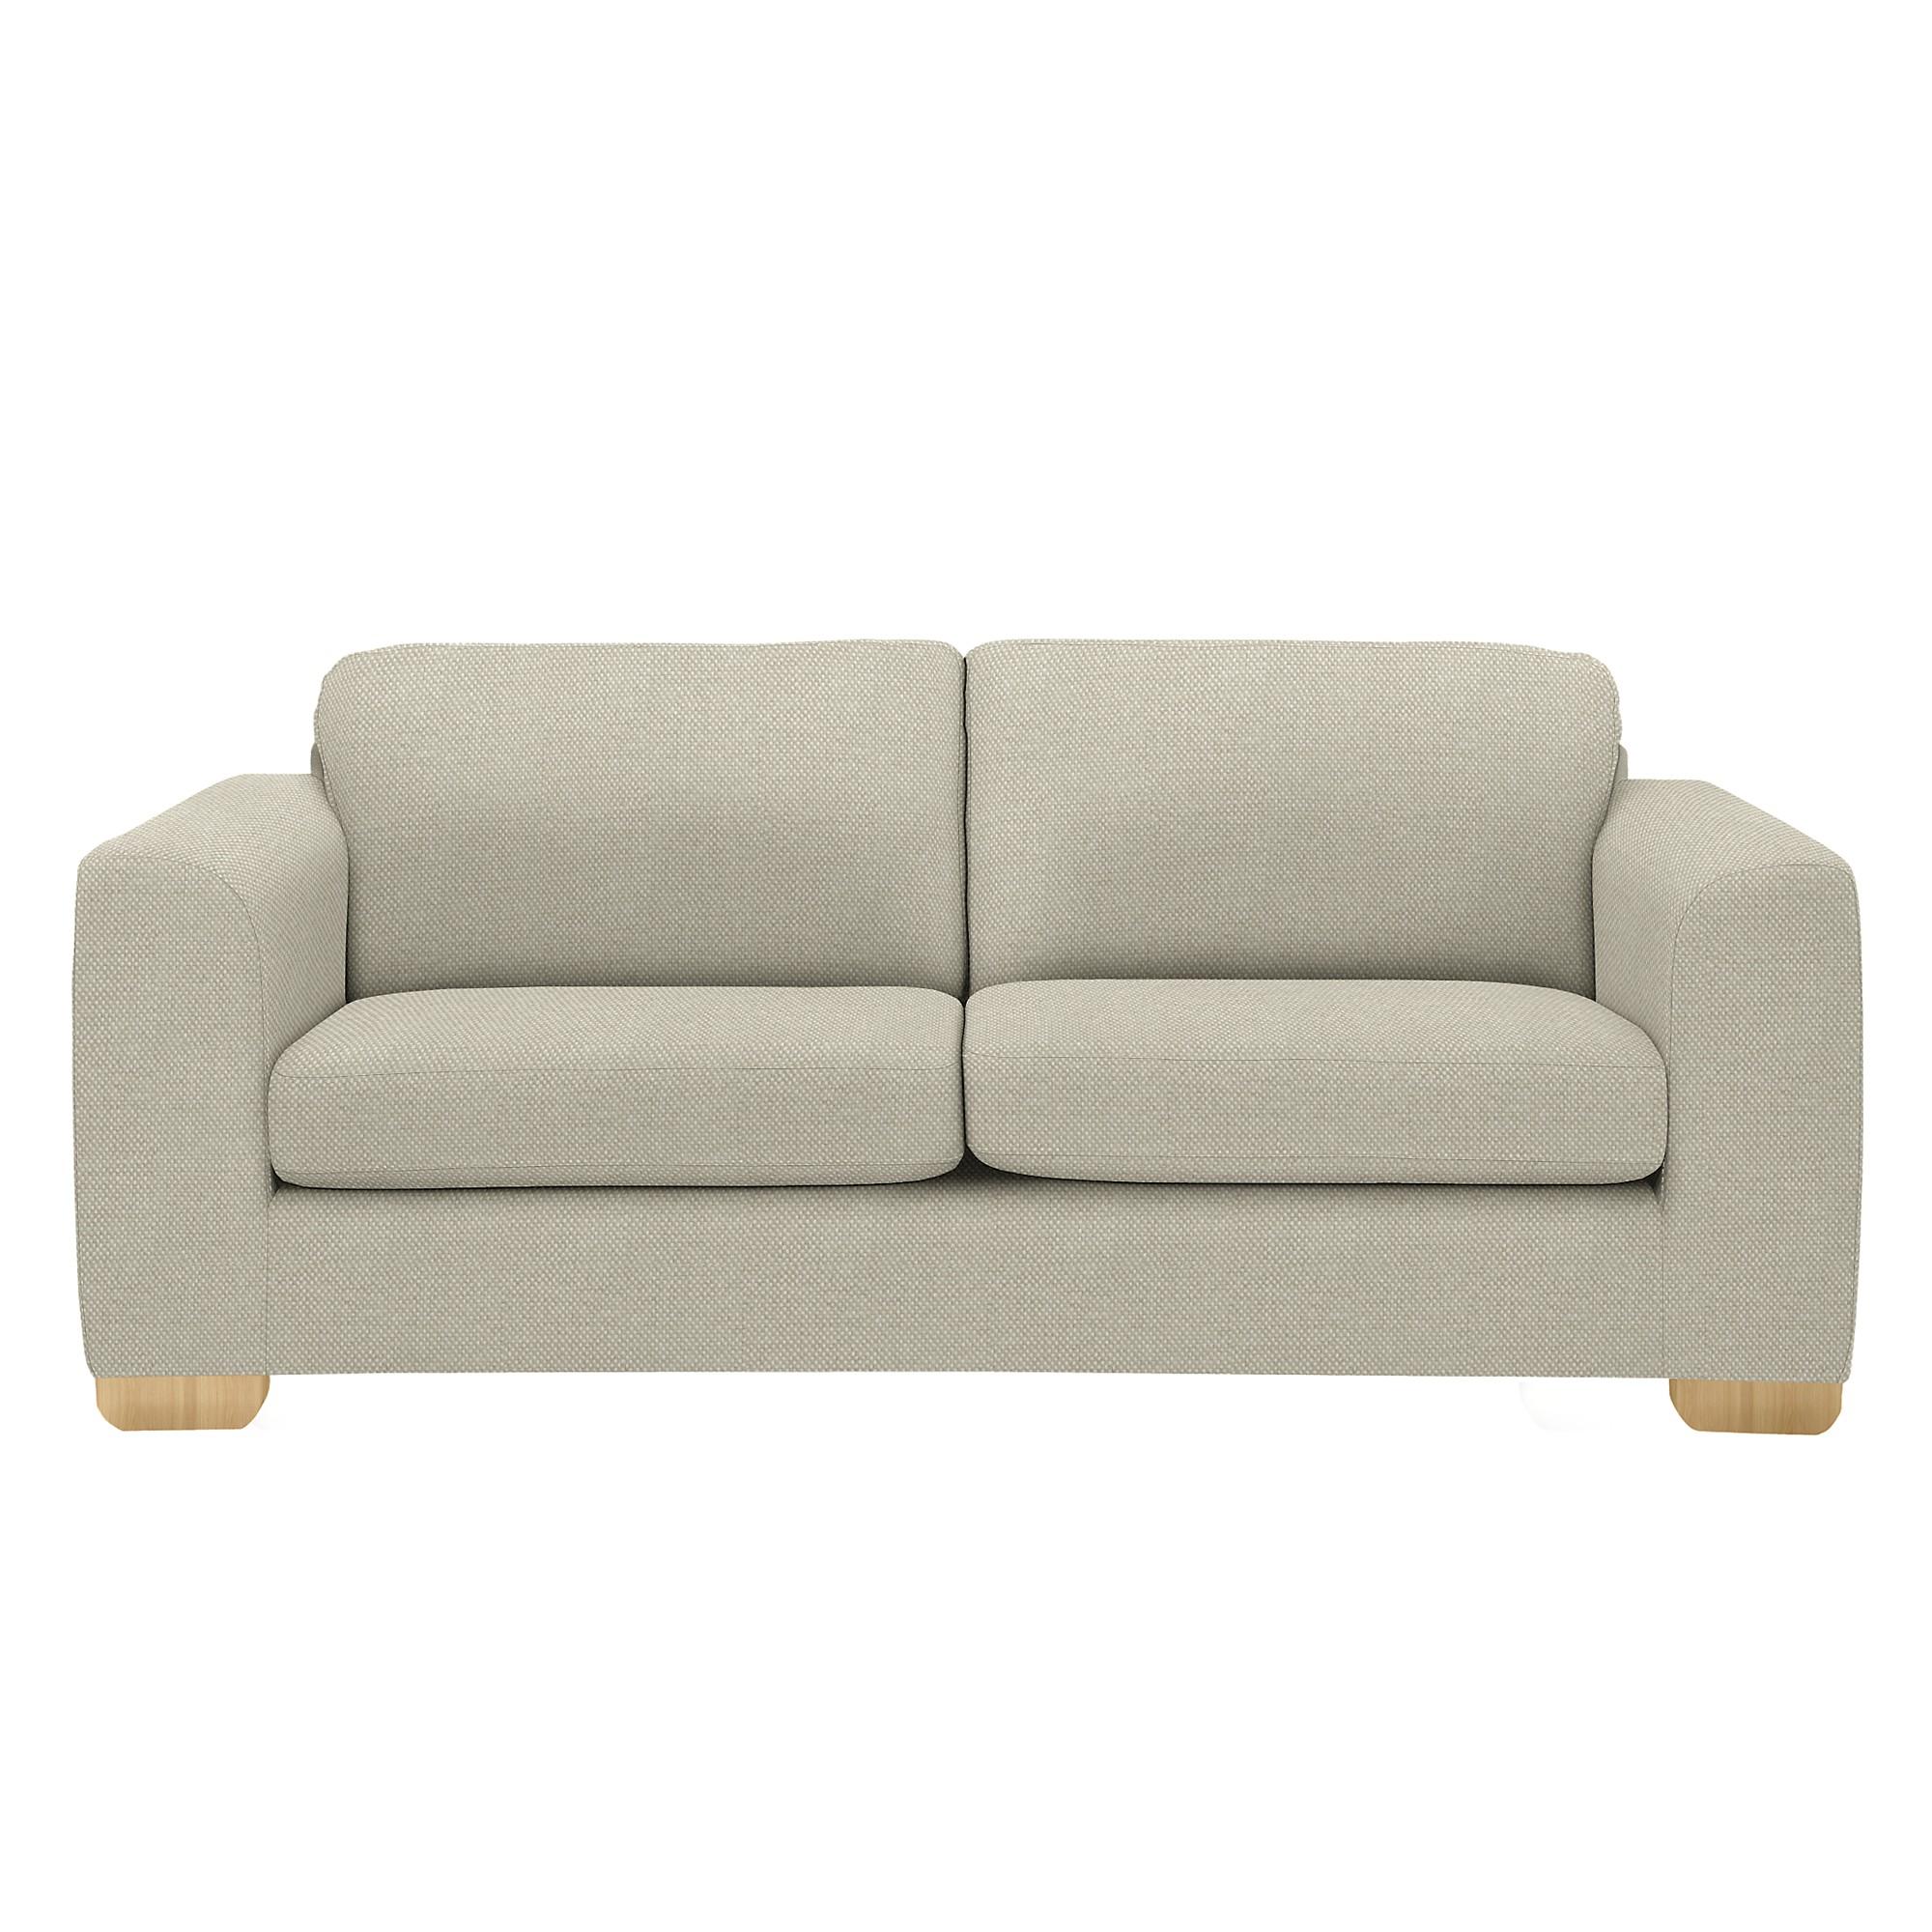 John Lewis Felix Large Sofa